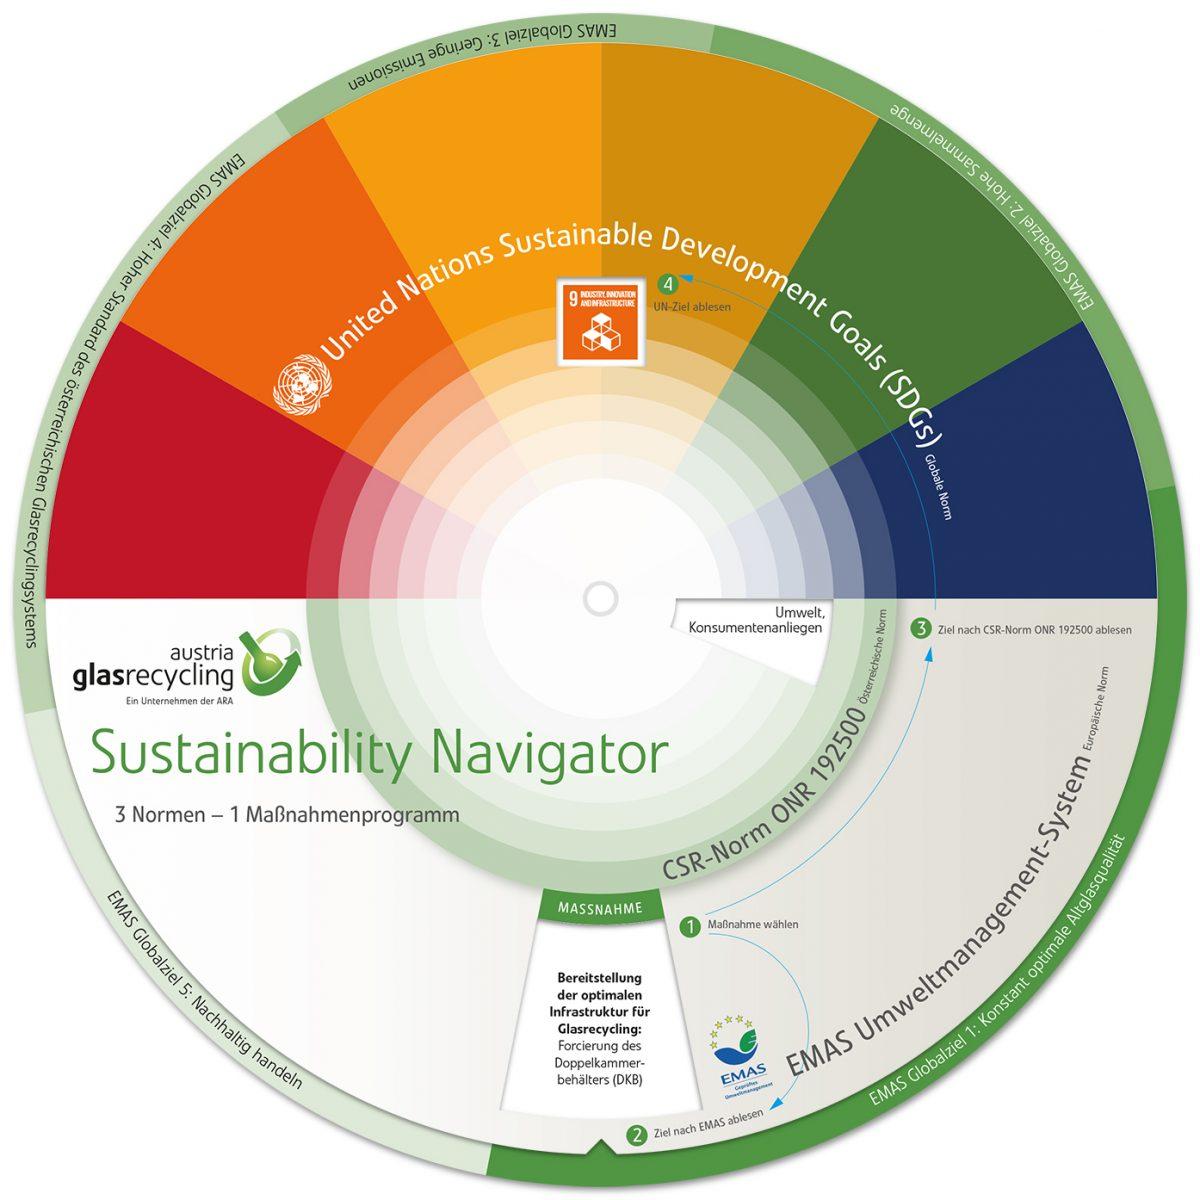 Austria-Glas-Recycling-Sustainability-Navigator